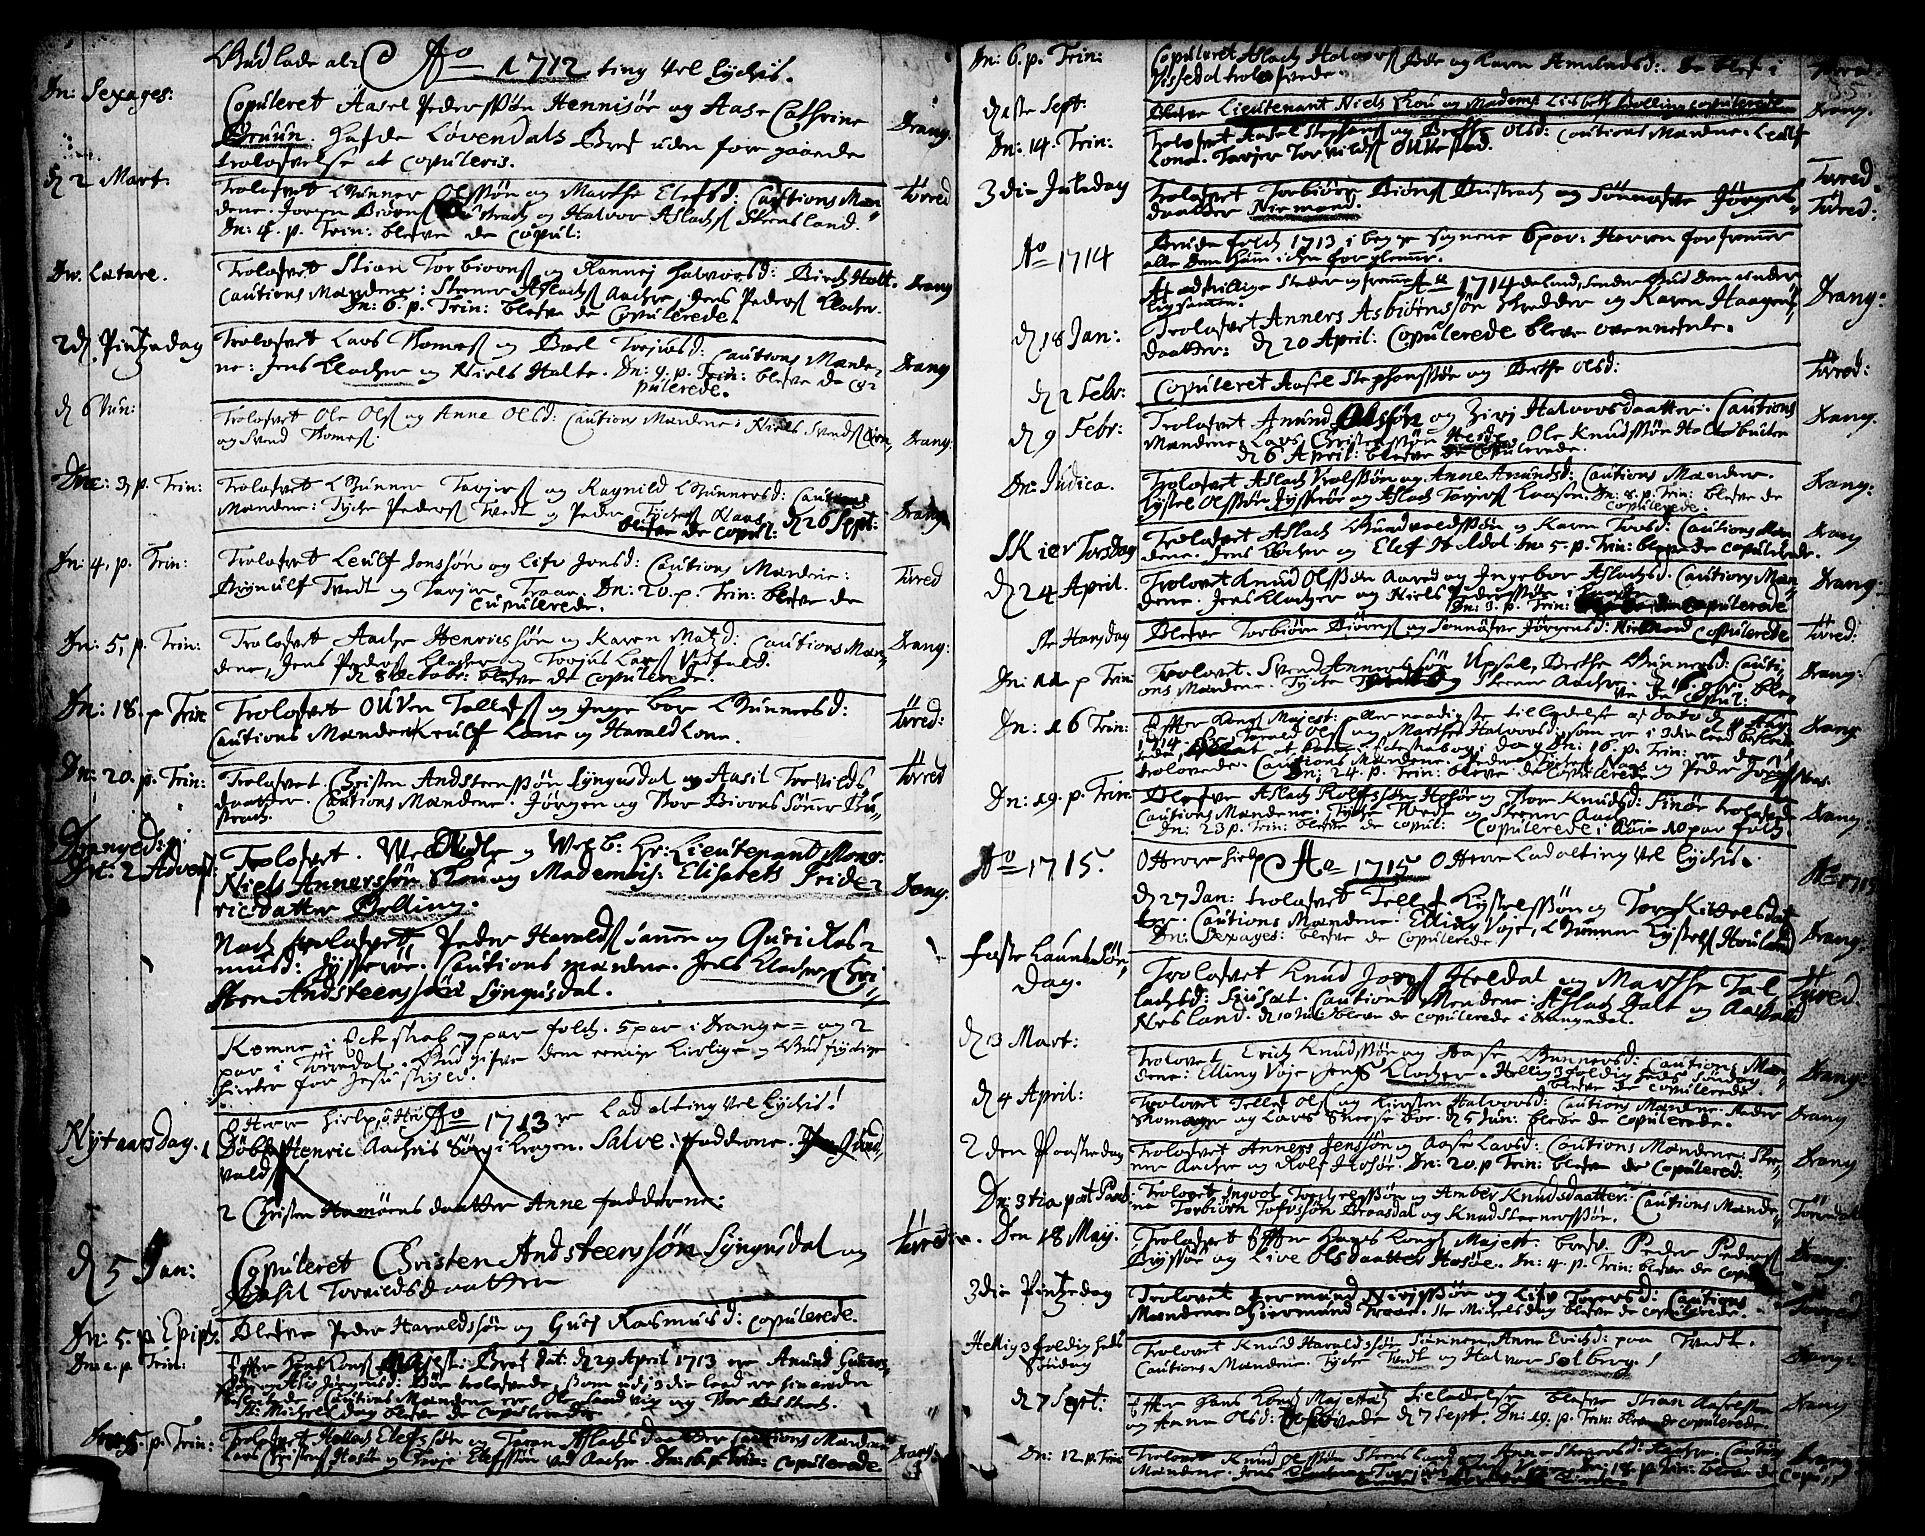 SAKO, Drangedal kirkebøker, F/Fa/L0001: Ministerialbok nr. 1, 1697-1767, s. 35